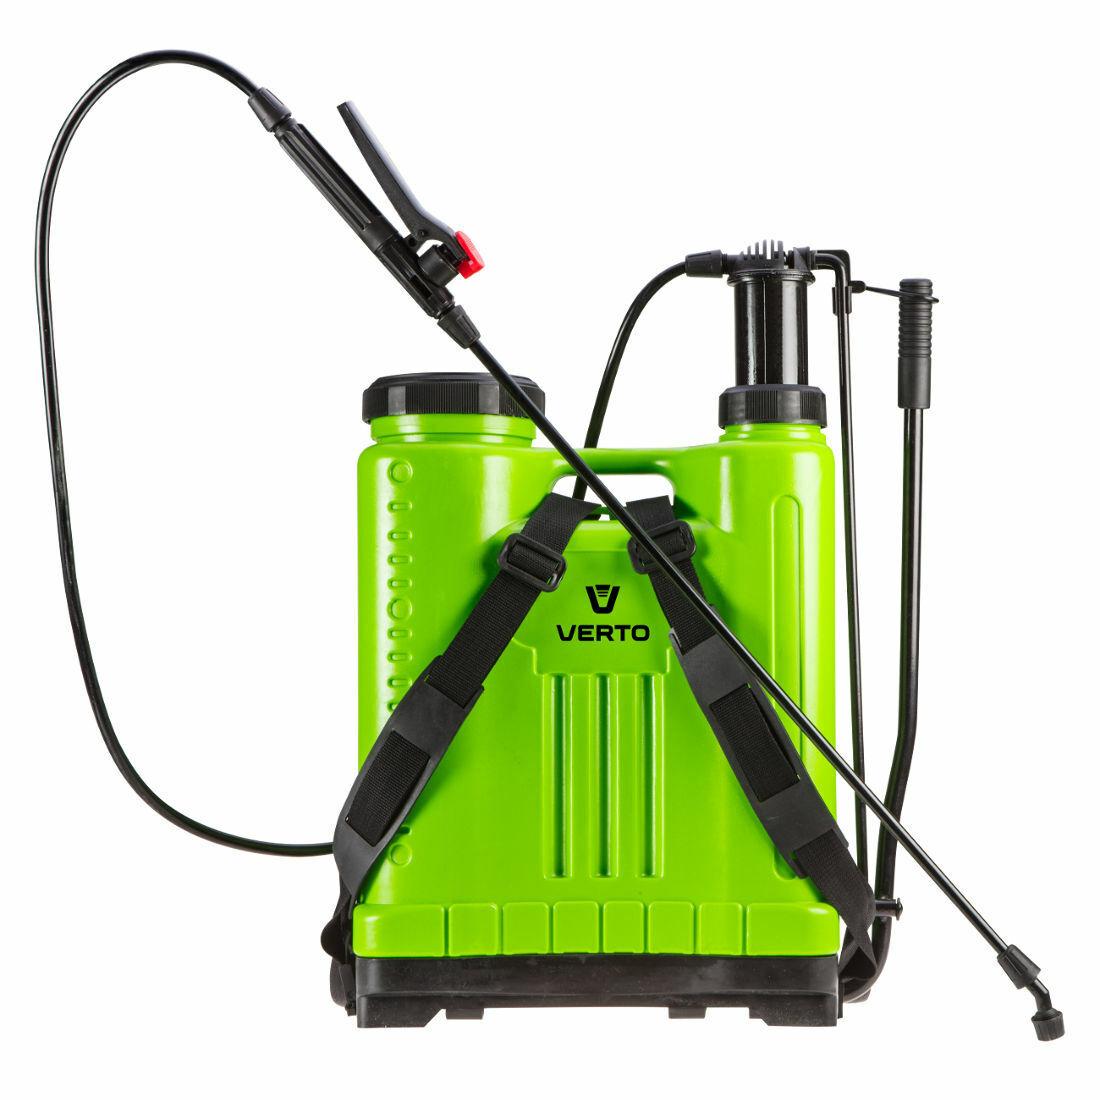 Profi Rückendrucksprühgerät 20 Liter Rückenspritze Drucksprühgerät Drucksprüher